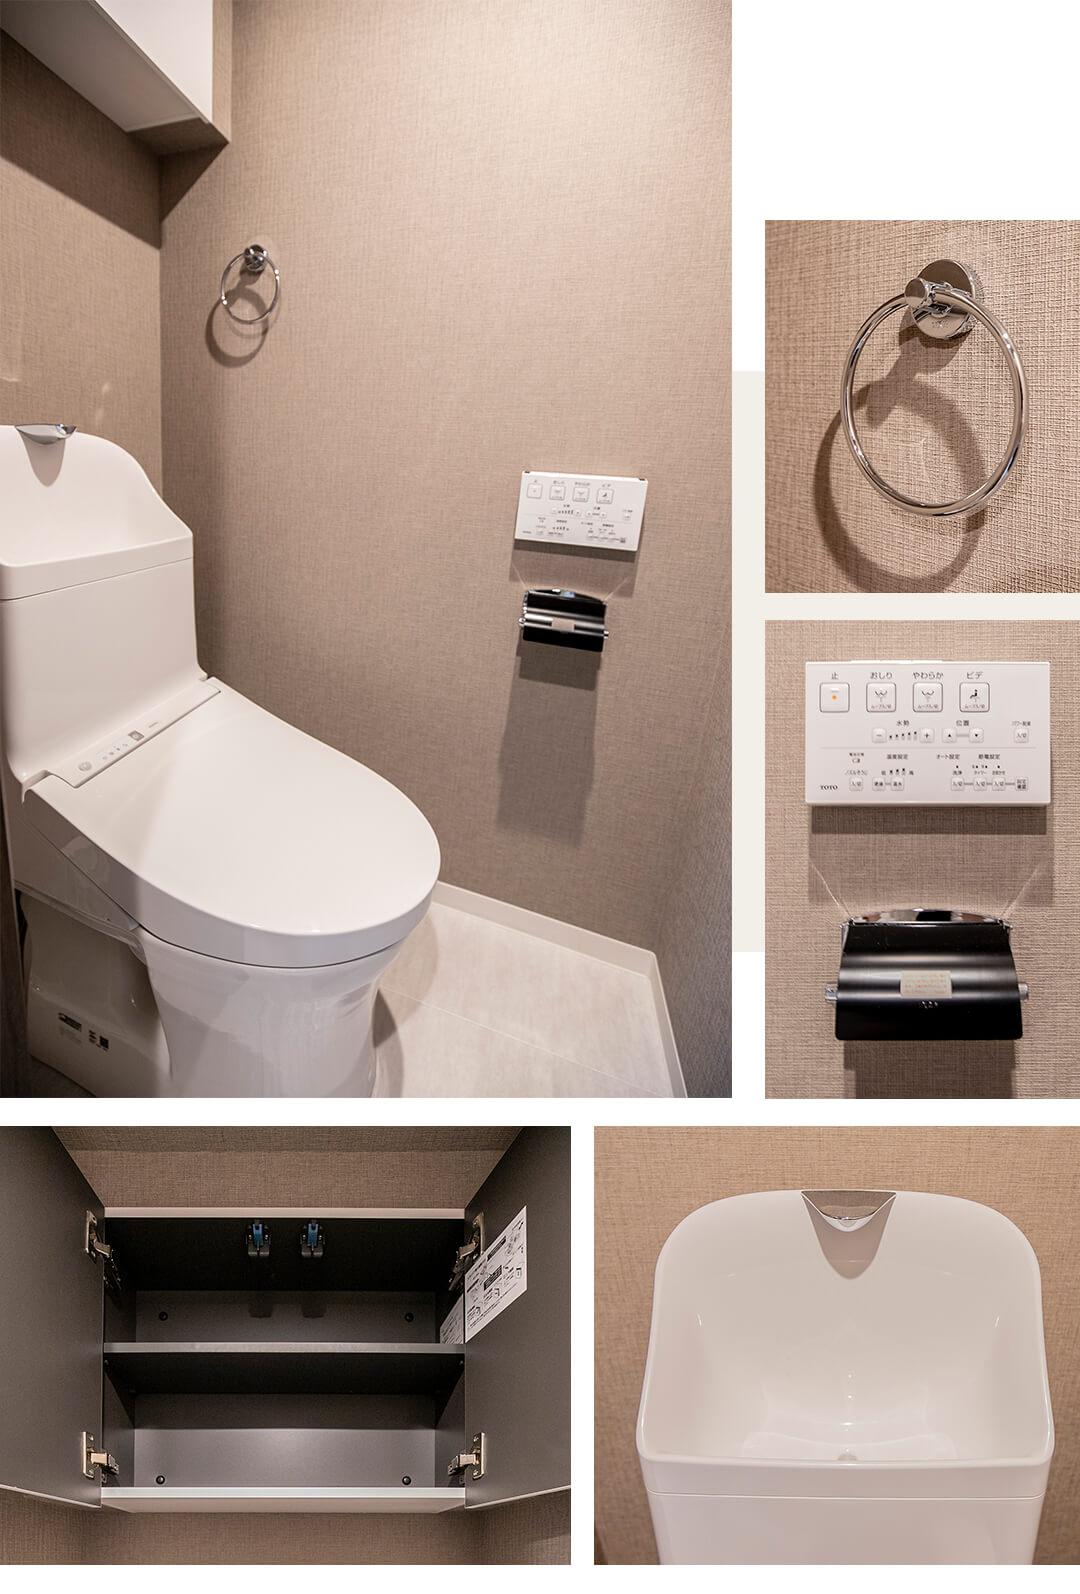 DOM経堂マンションのトイレ